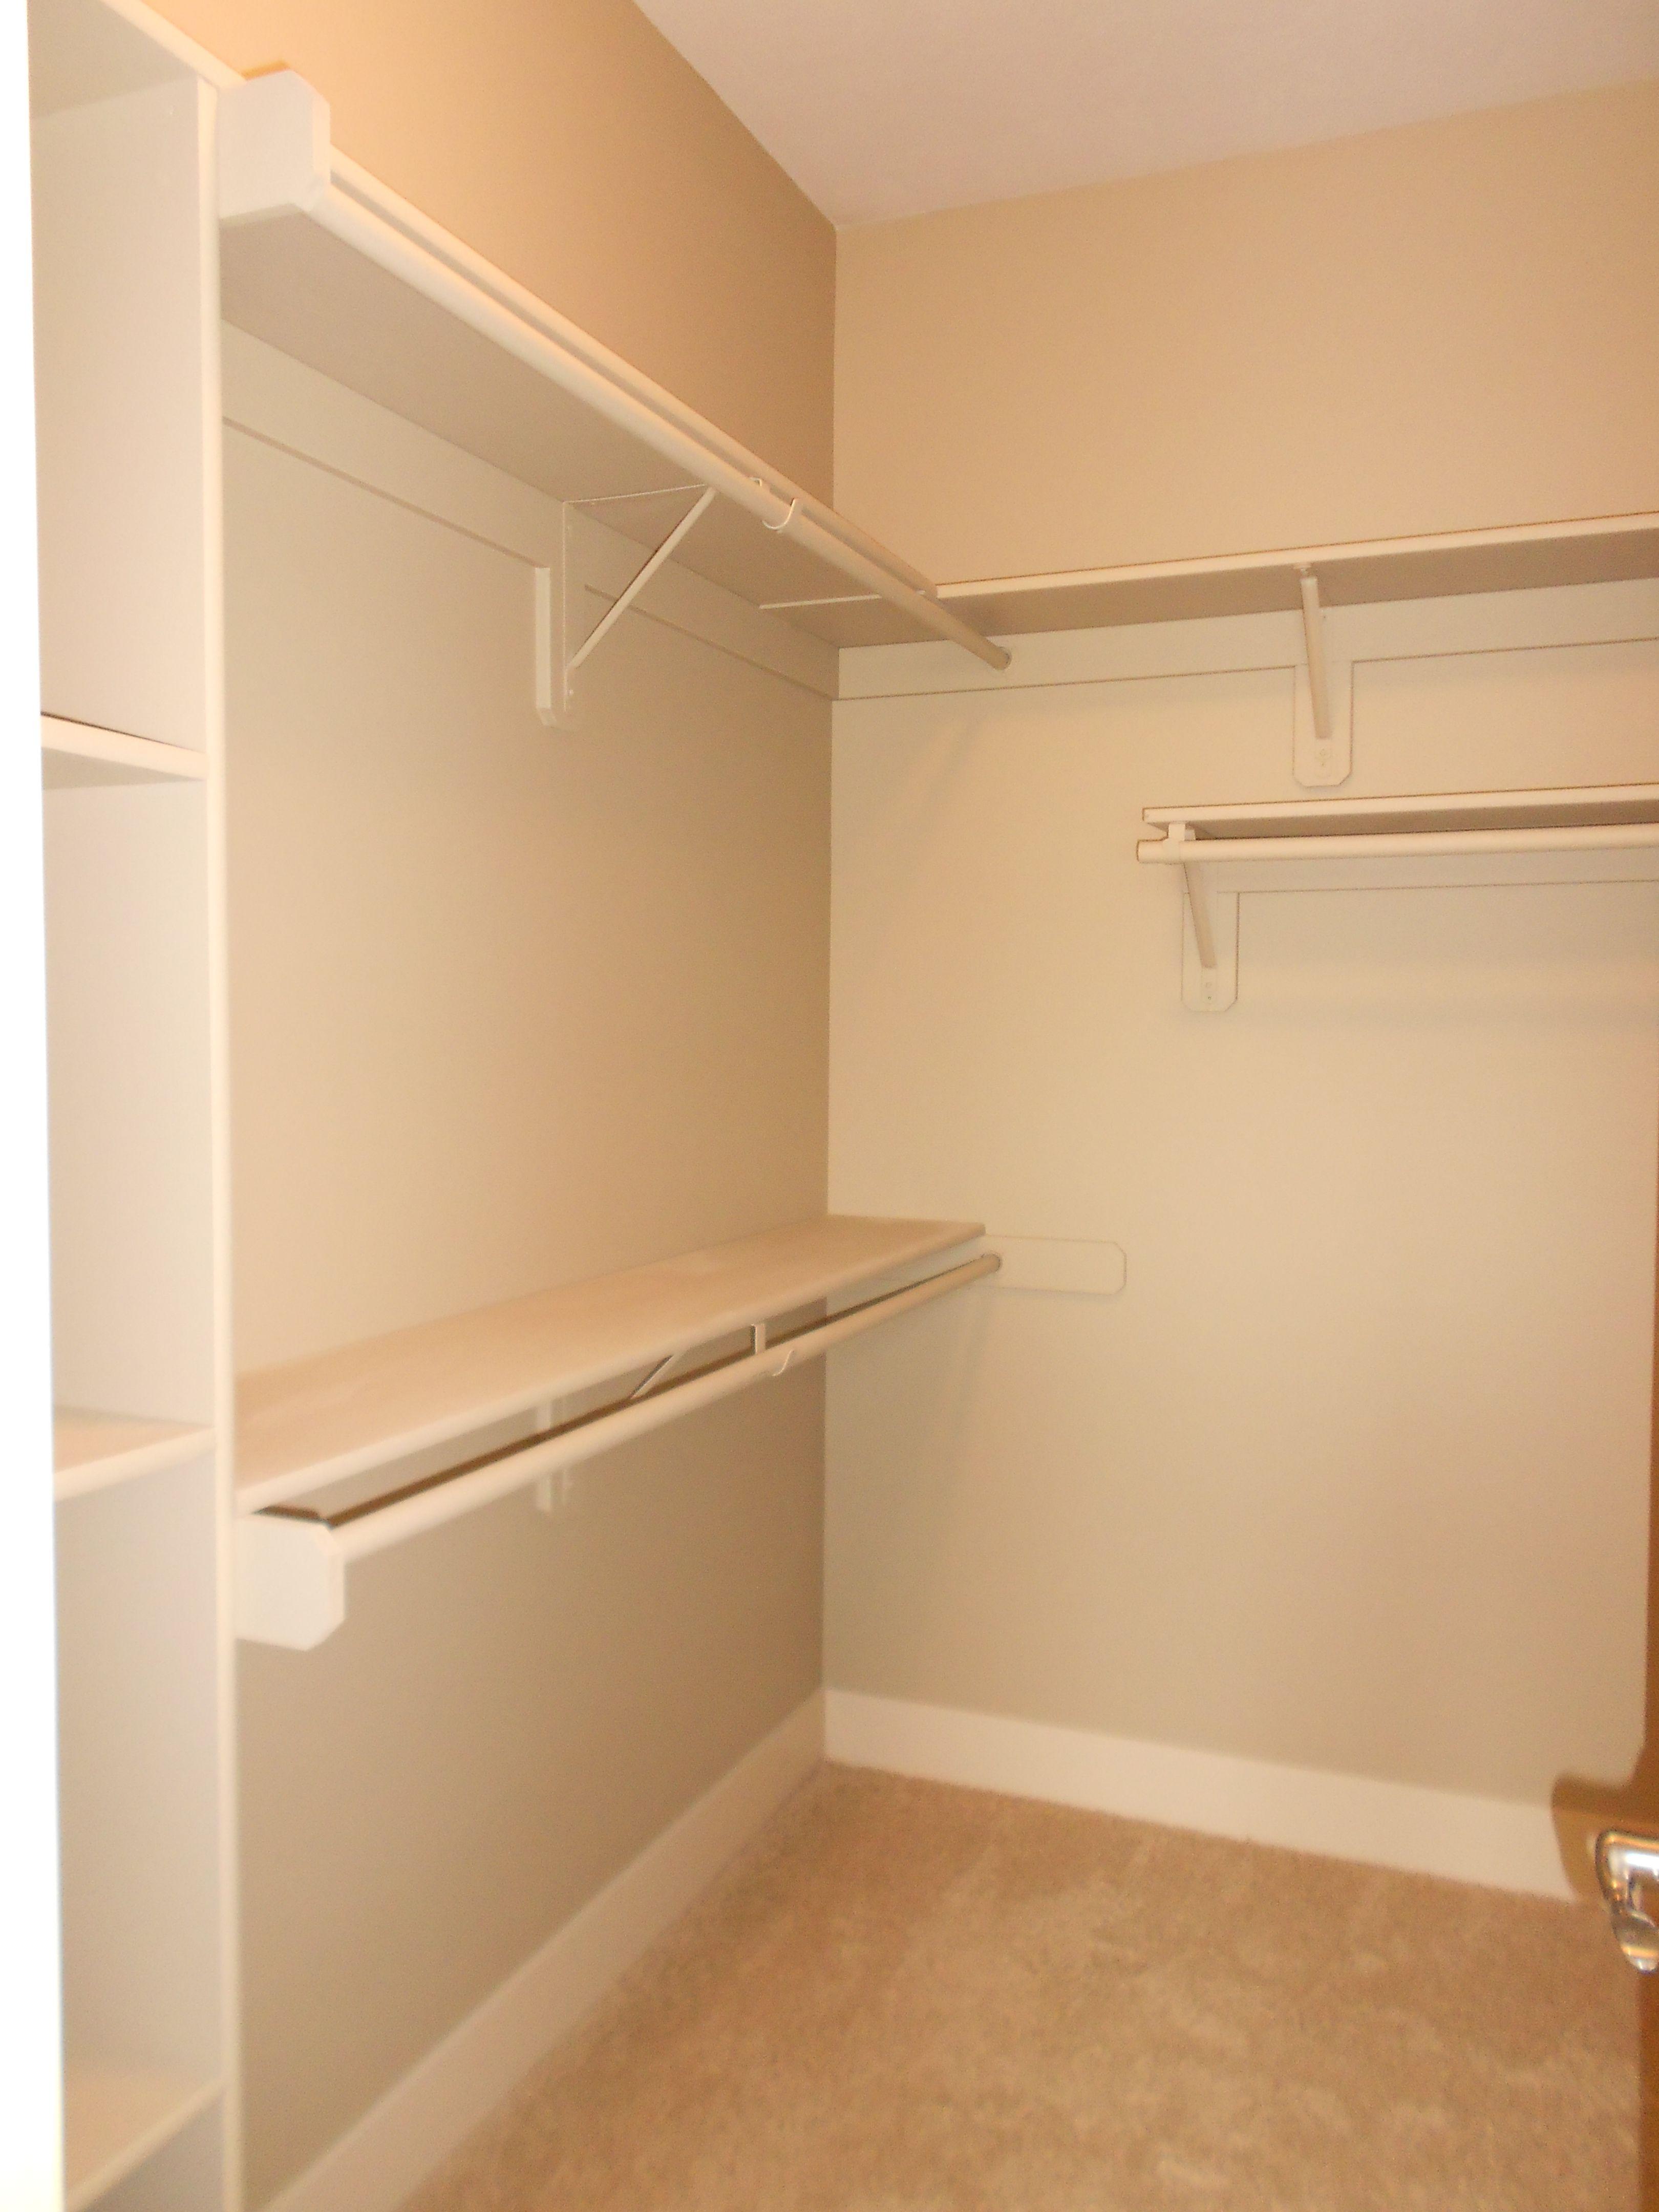 Walk-in Closet!! - The Jordan   Small walk-in closet   Pinterest ...